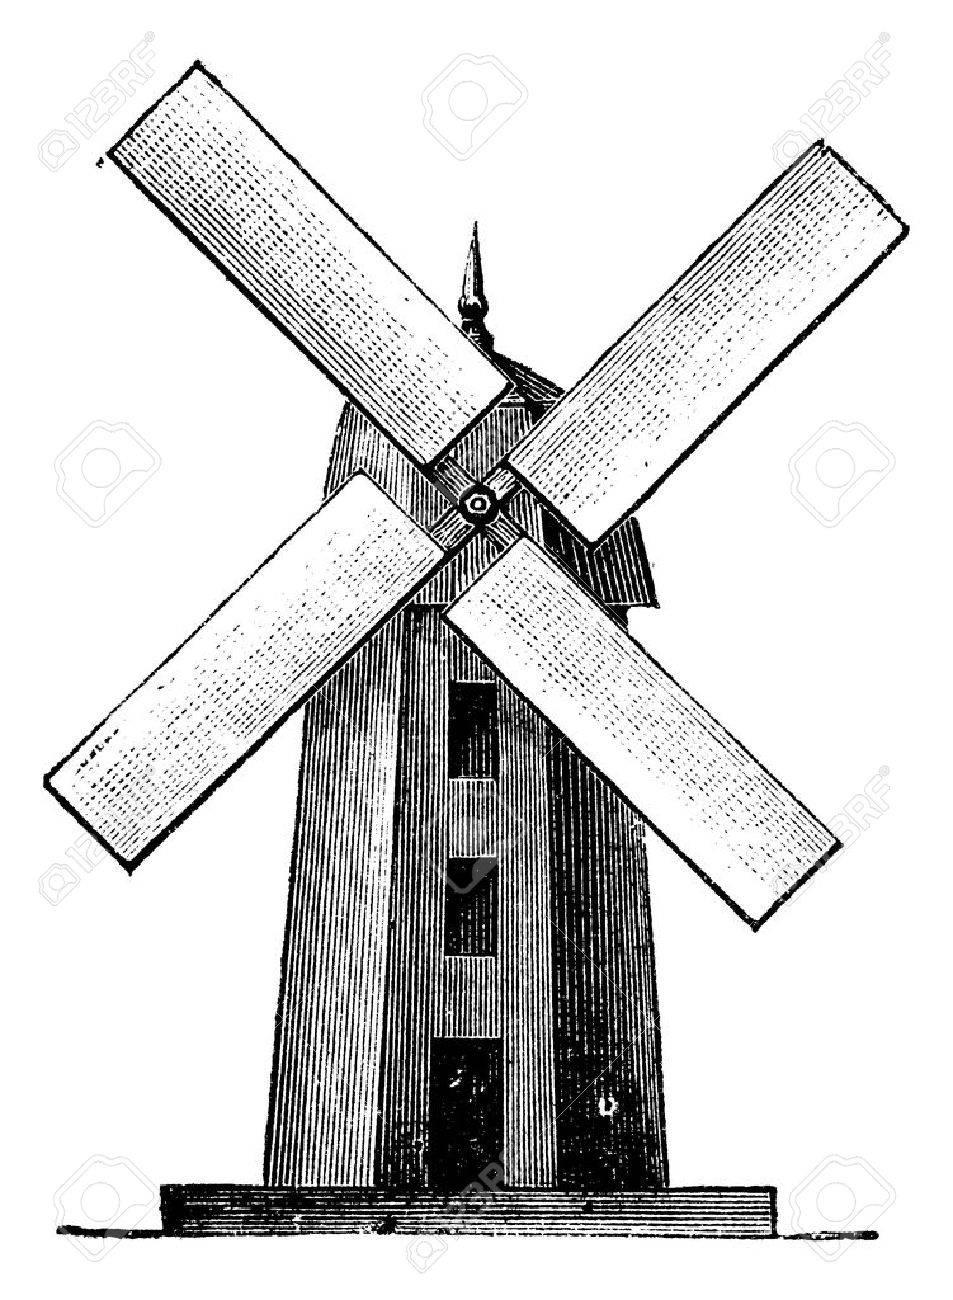 Windmill, vintage engraved illustration. Trousset encyclopedia (1886 - 1891). Stock Vector - 13770598